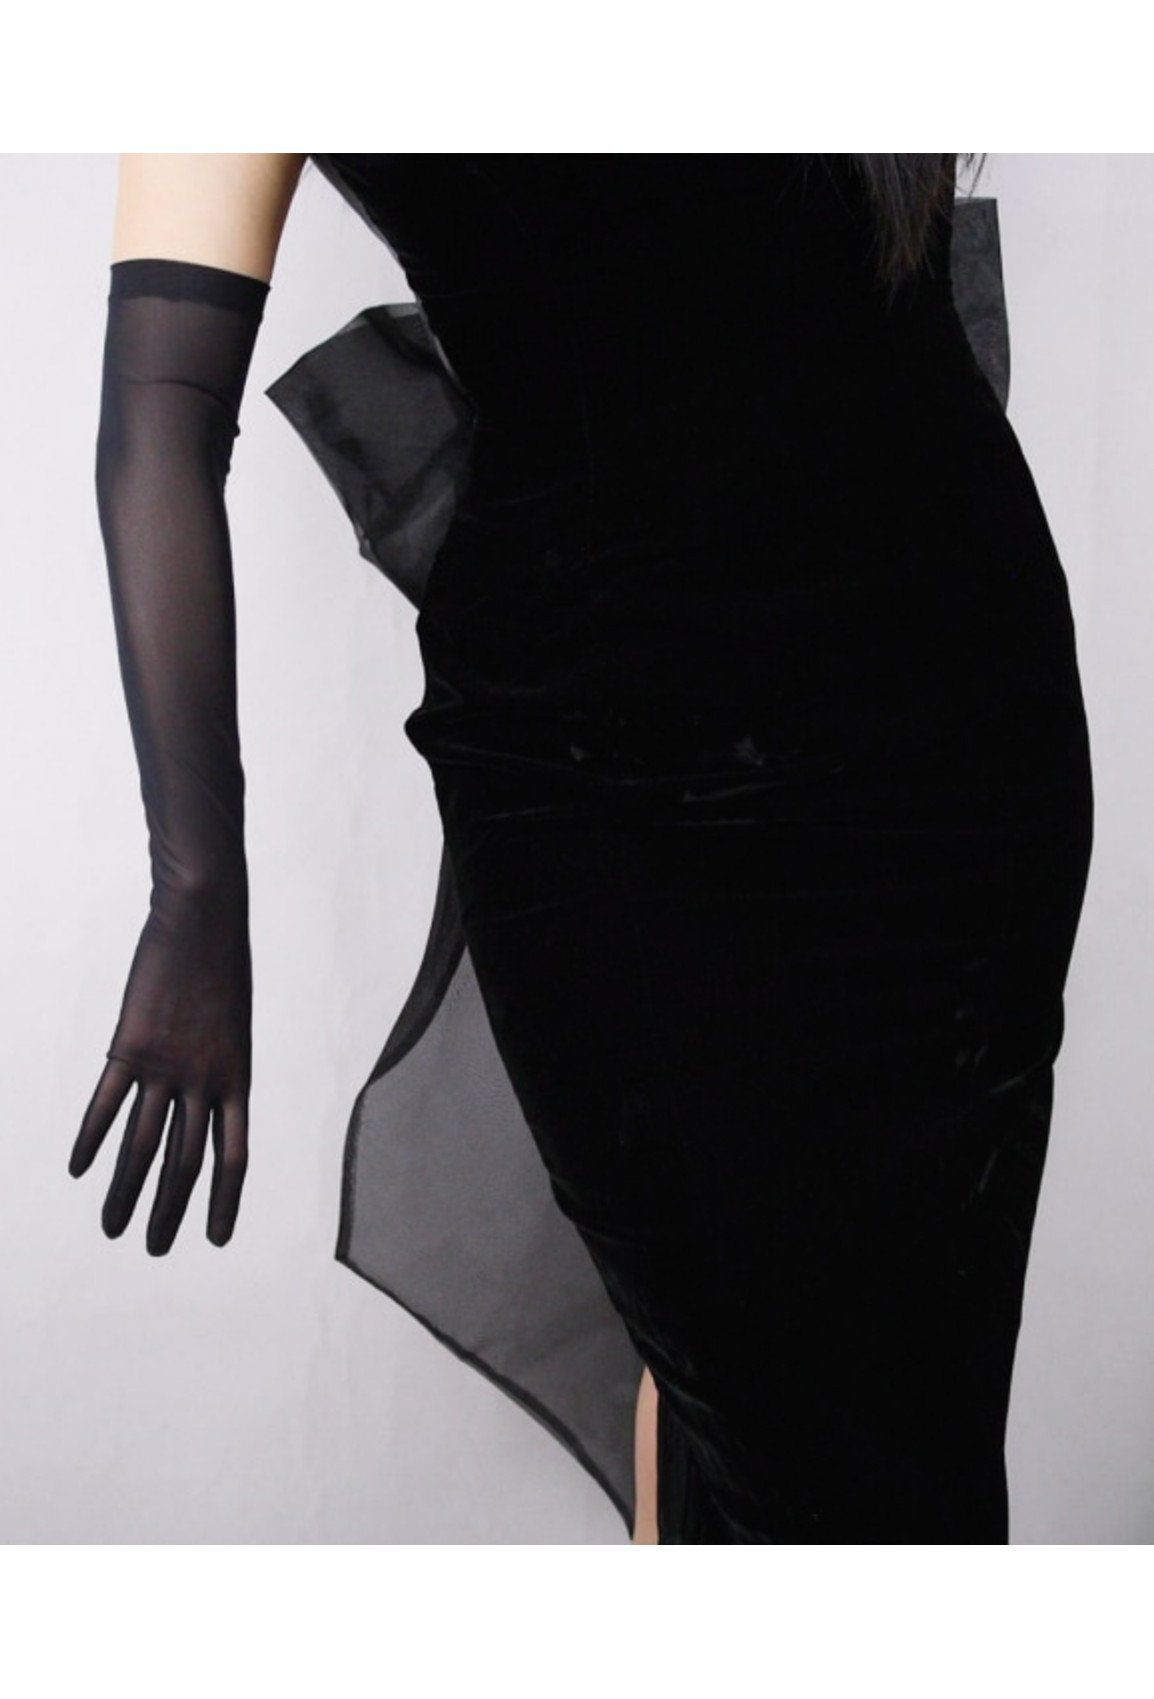 Vintage Style Satin Long Opera Mesh Evening Glove Ebony Black Long Gloves Lace Gloves Evening Gloves [ 1699 x 1154 Pixel ]